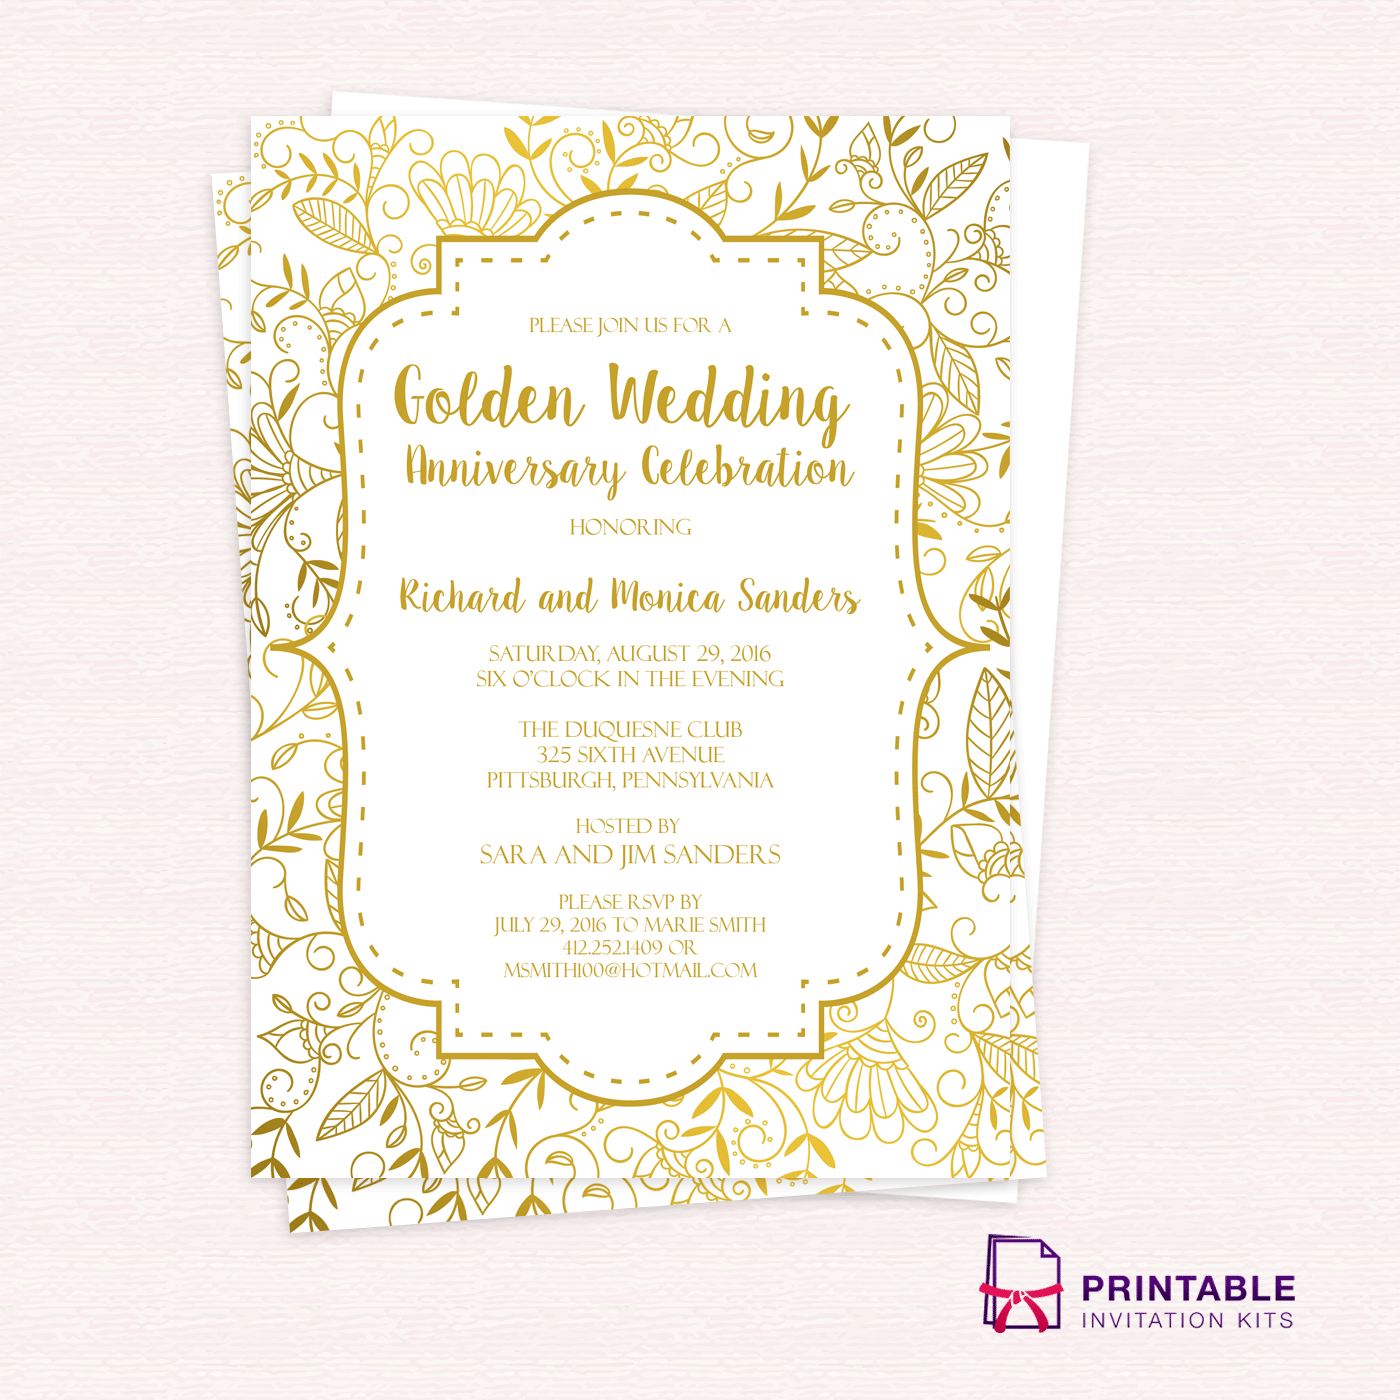 Golden Wedding Anniversary Invitation Template | 50Th Wedding - Free Printable 60Th Wedding Anniversary Invitations